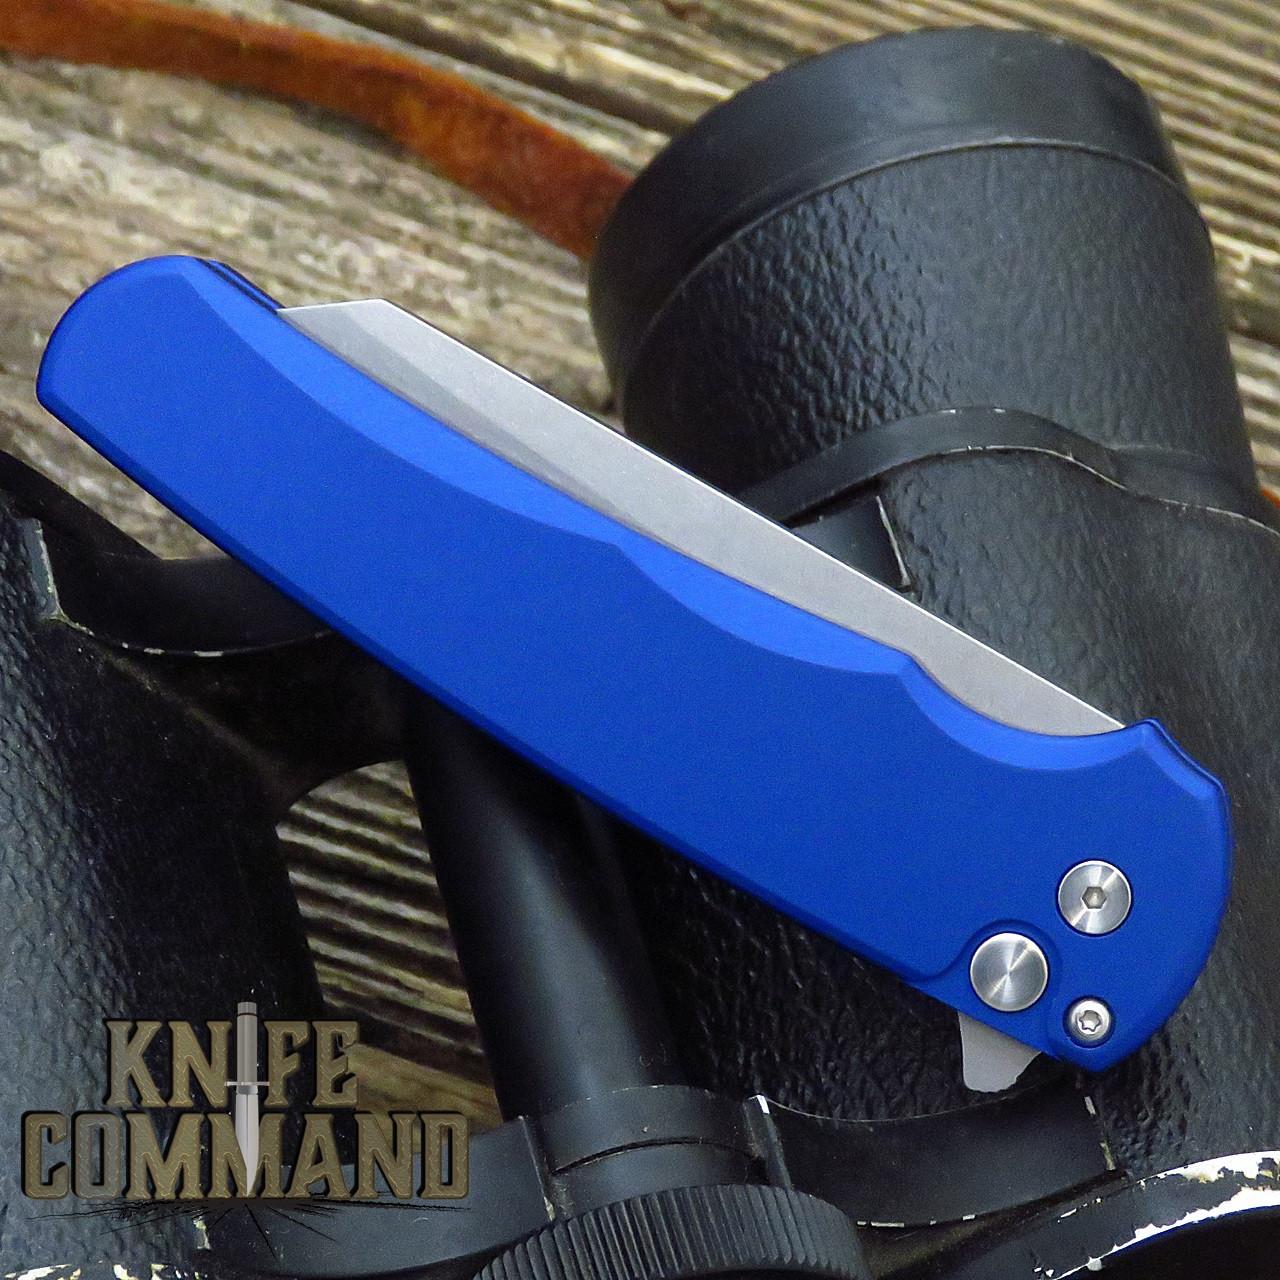 "Pro-Tech Knives 5201 Blue Malibu Manual Flipper Knife Folder 3.25"" Stonewash CPM-20CV Reverse Tanto Blade"